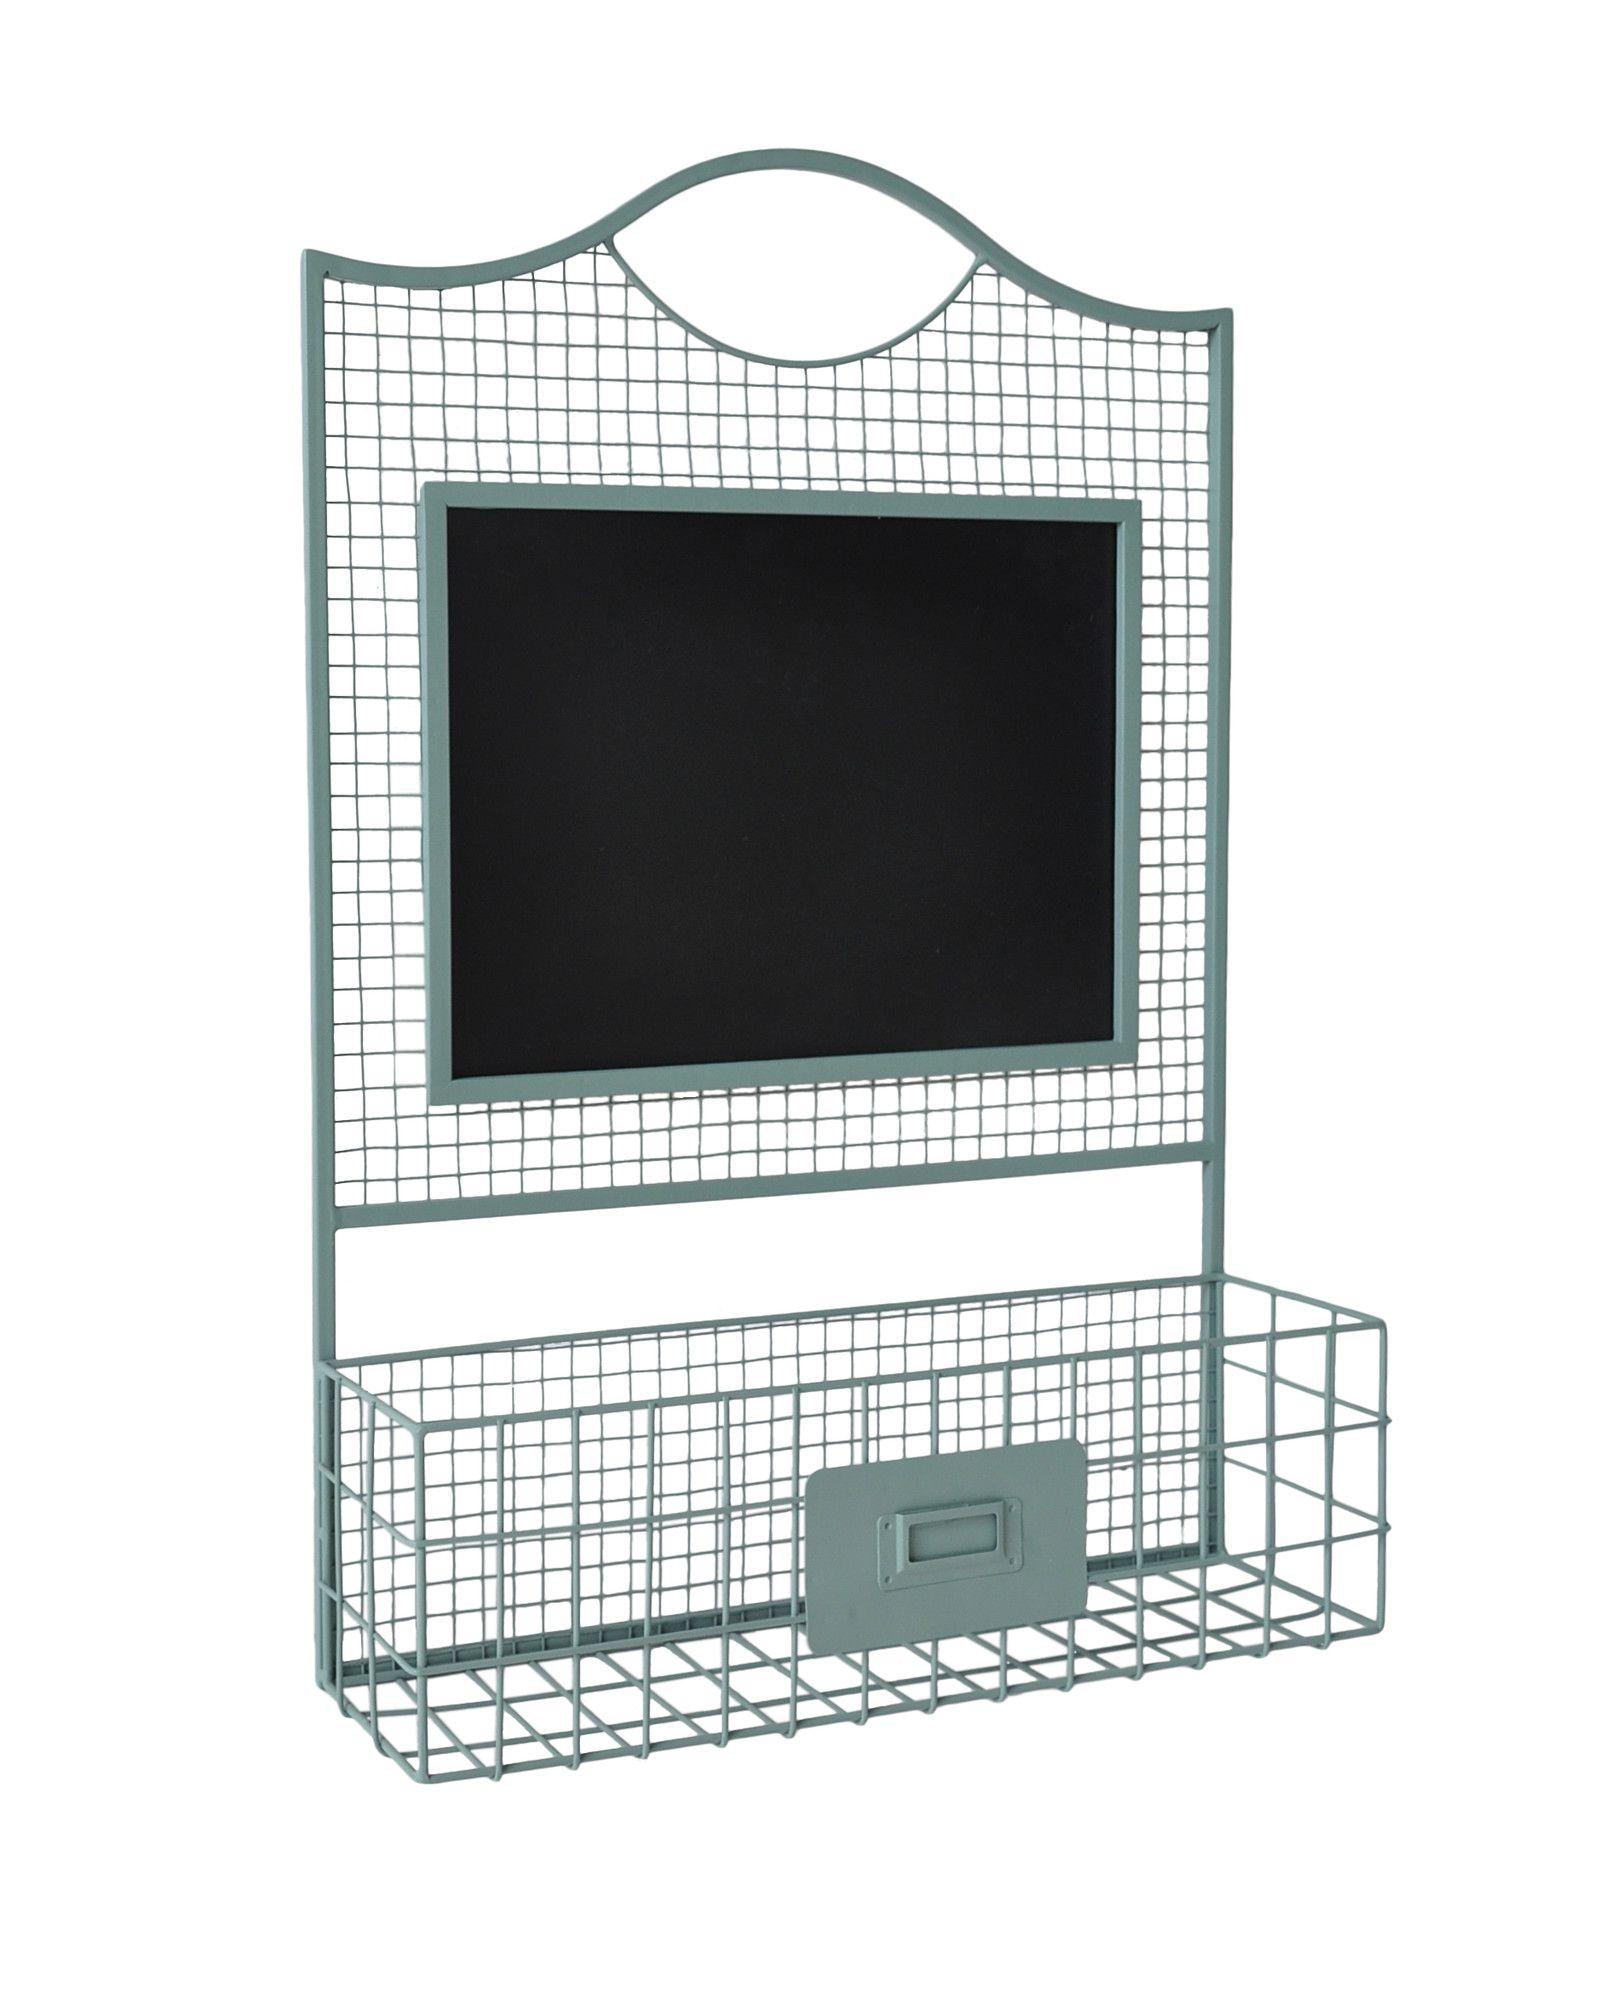 Eva Wall Rack & Chalkboard | Products | Pinterest | Basket ...